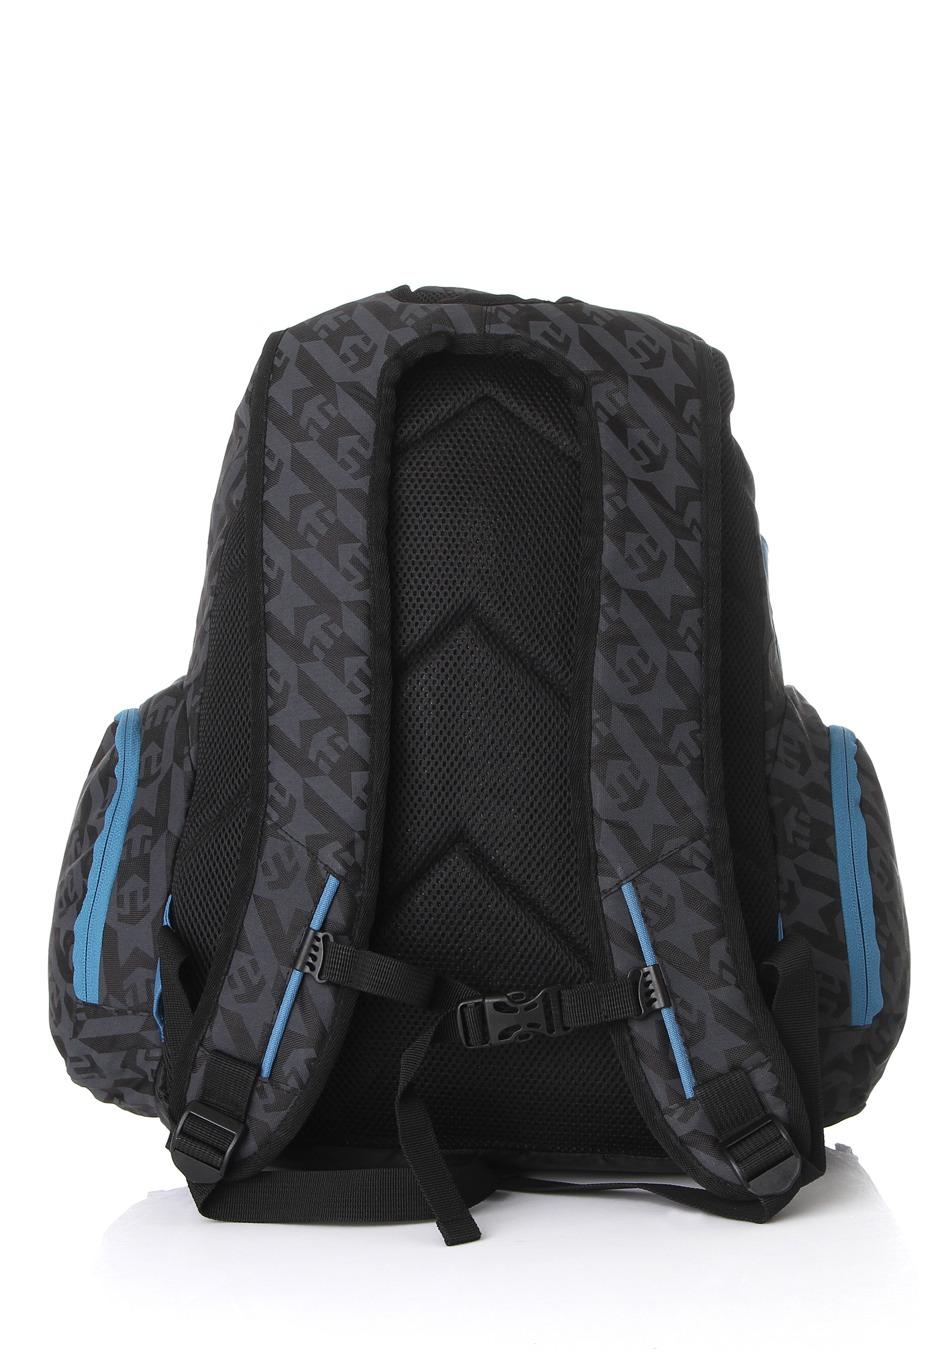 0d81543330f0 Etnies - Drake Black Grey - Backpack - Streetwear Shop - Impericon ...